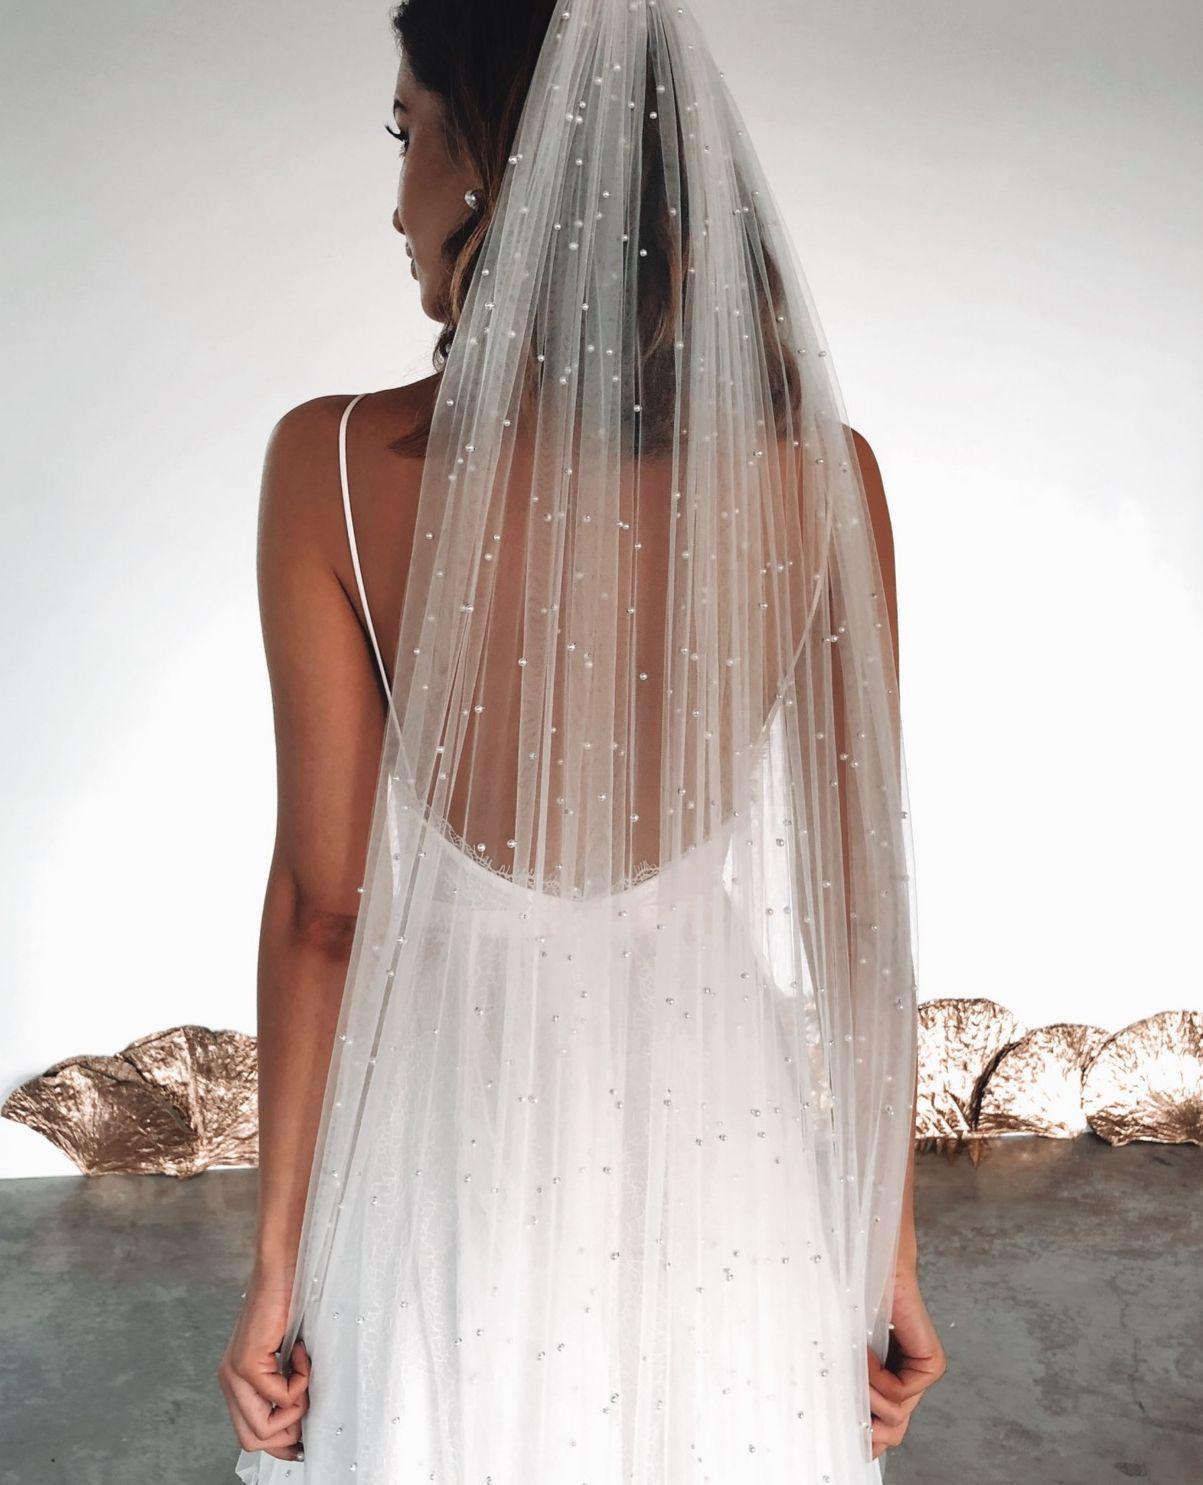 Pearly Long Veil Bridal Veil With Pearls Grace Loves Lace Long Veils Bridal Dream Wedding Dresses Short Veils Bridal [ 1485 x 1203 Pixel ]